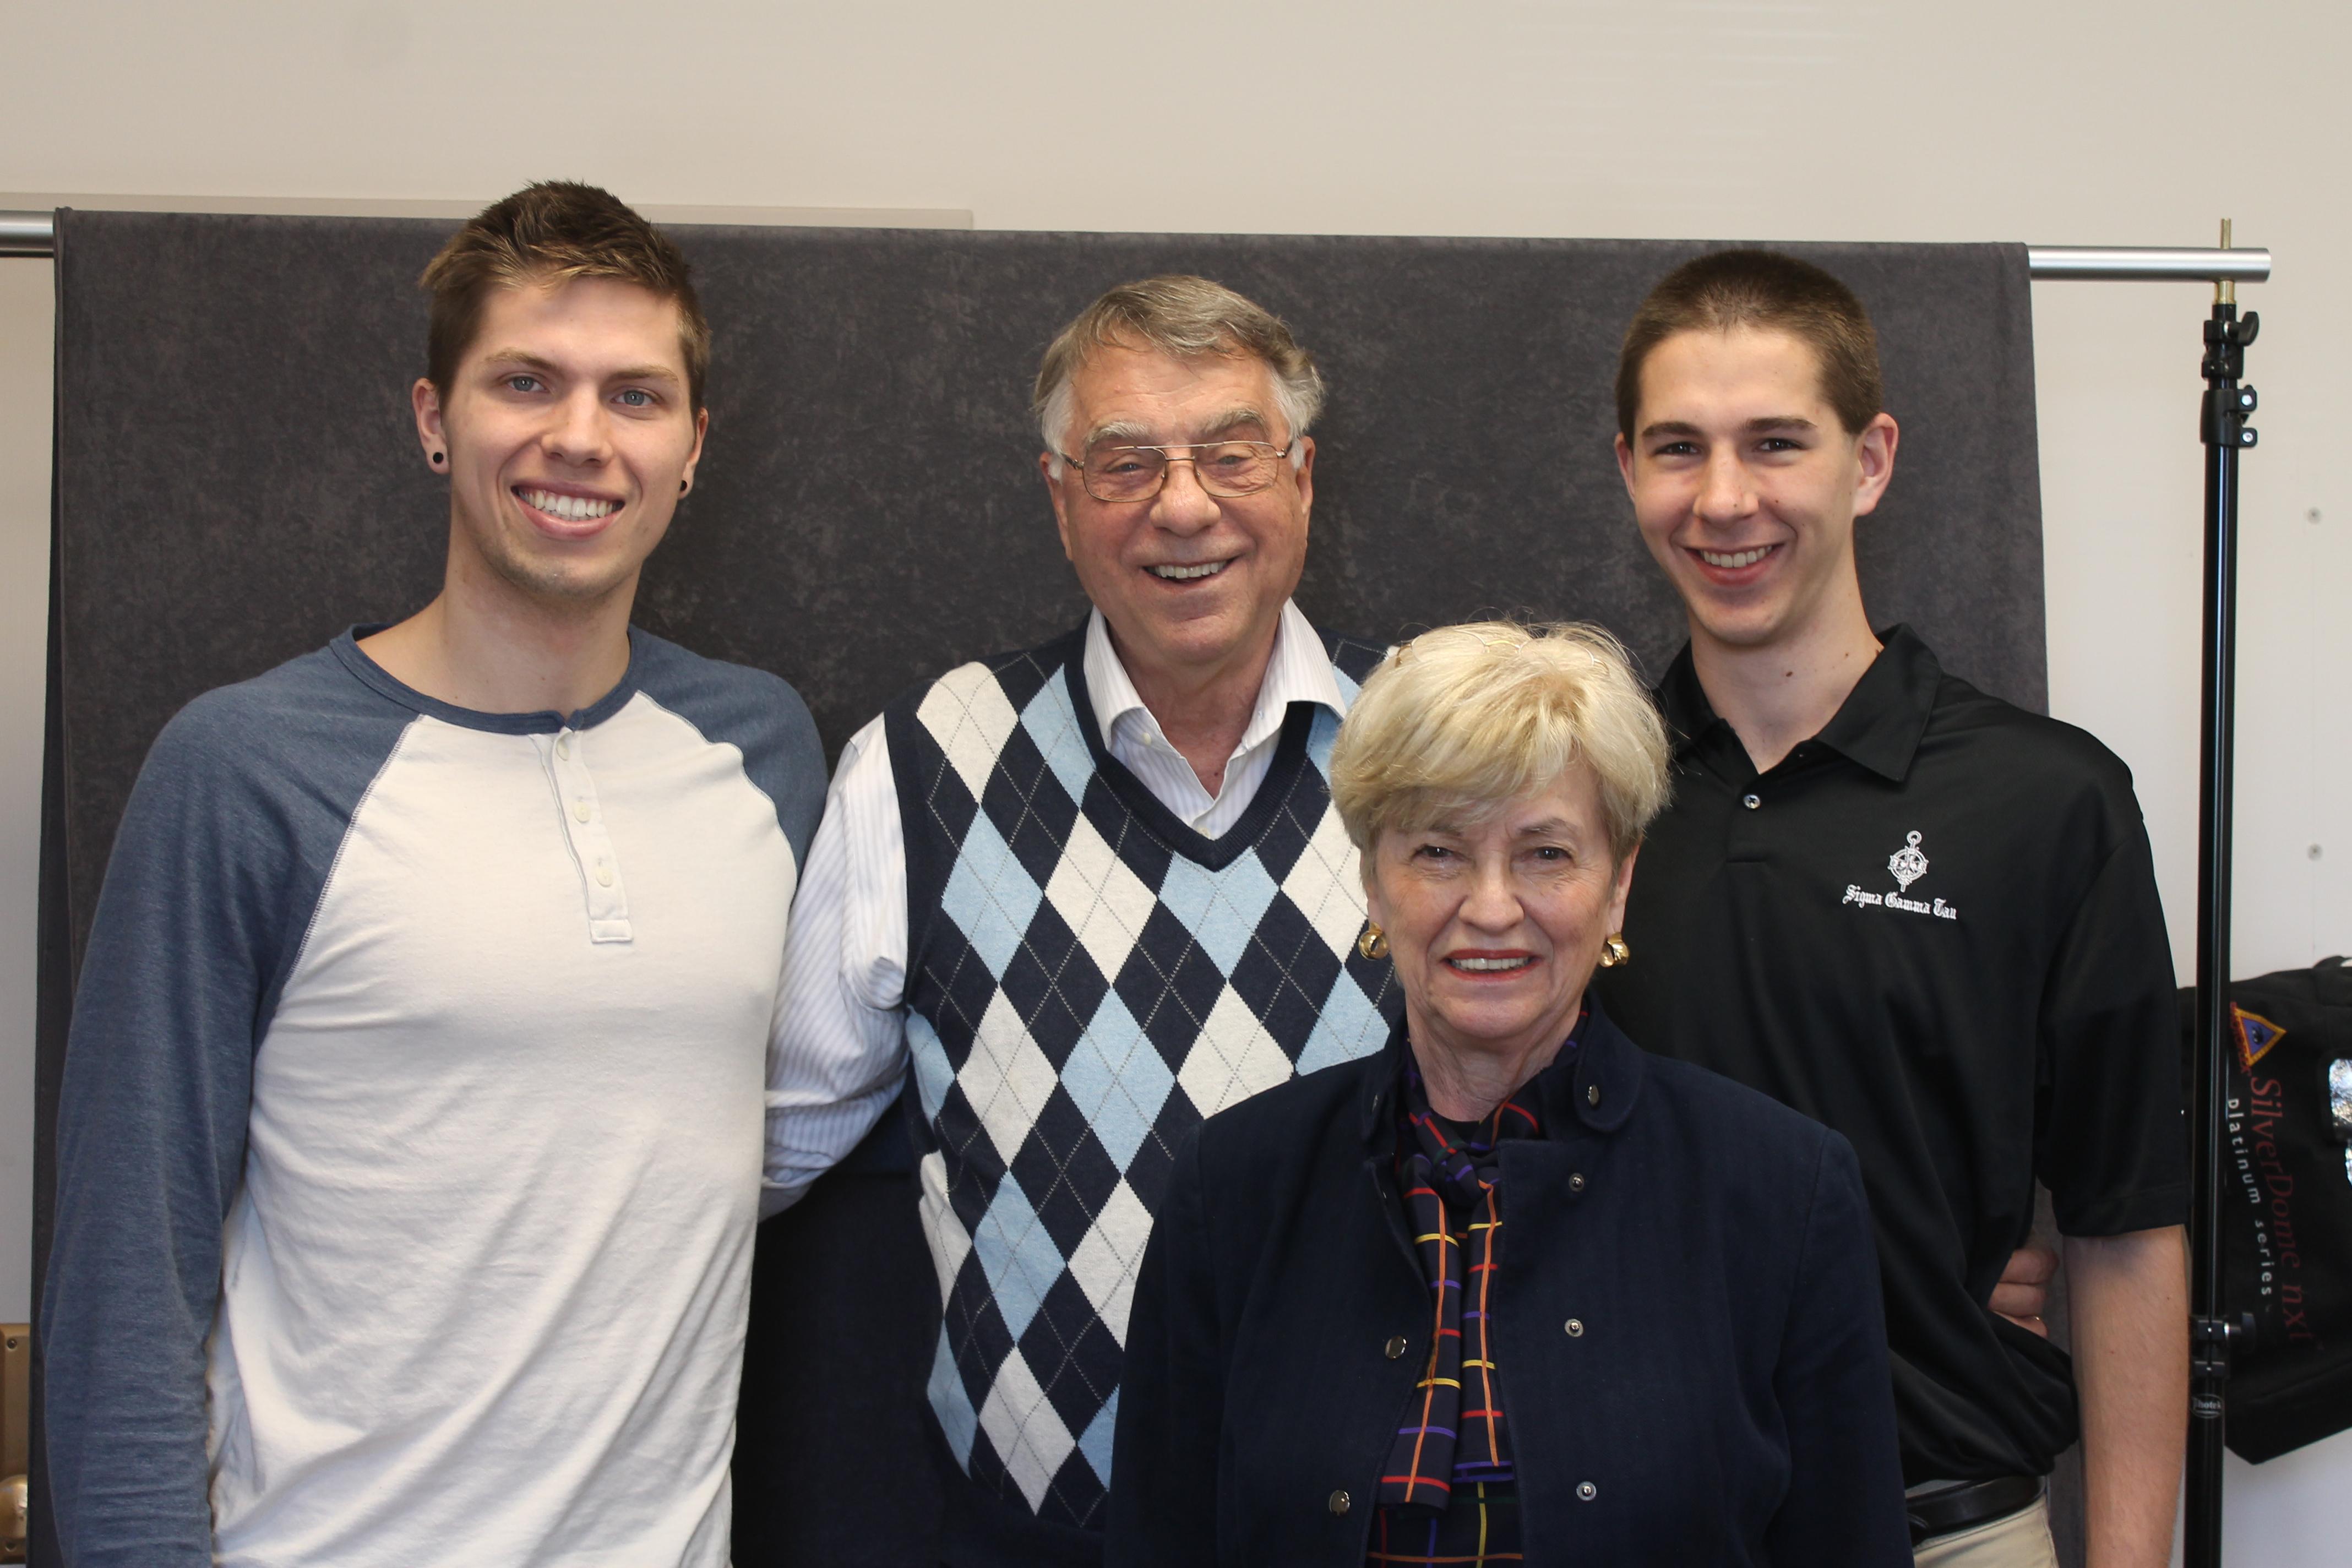 (Left to right) AerE junior Ben Waalen, ME '62 alum Dale Johnson, Jan Johnson and AerE junior Matt Gustafson.